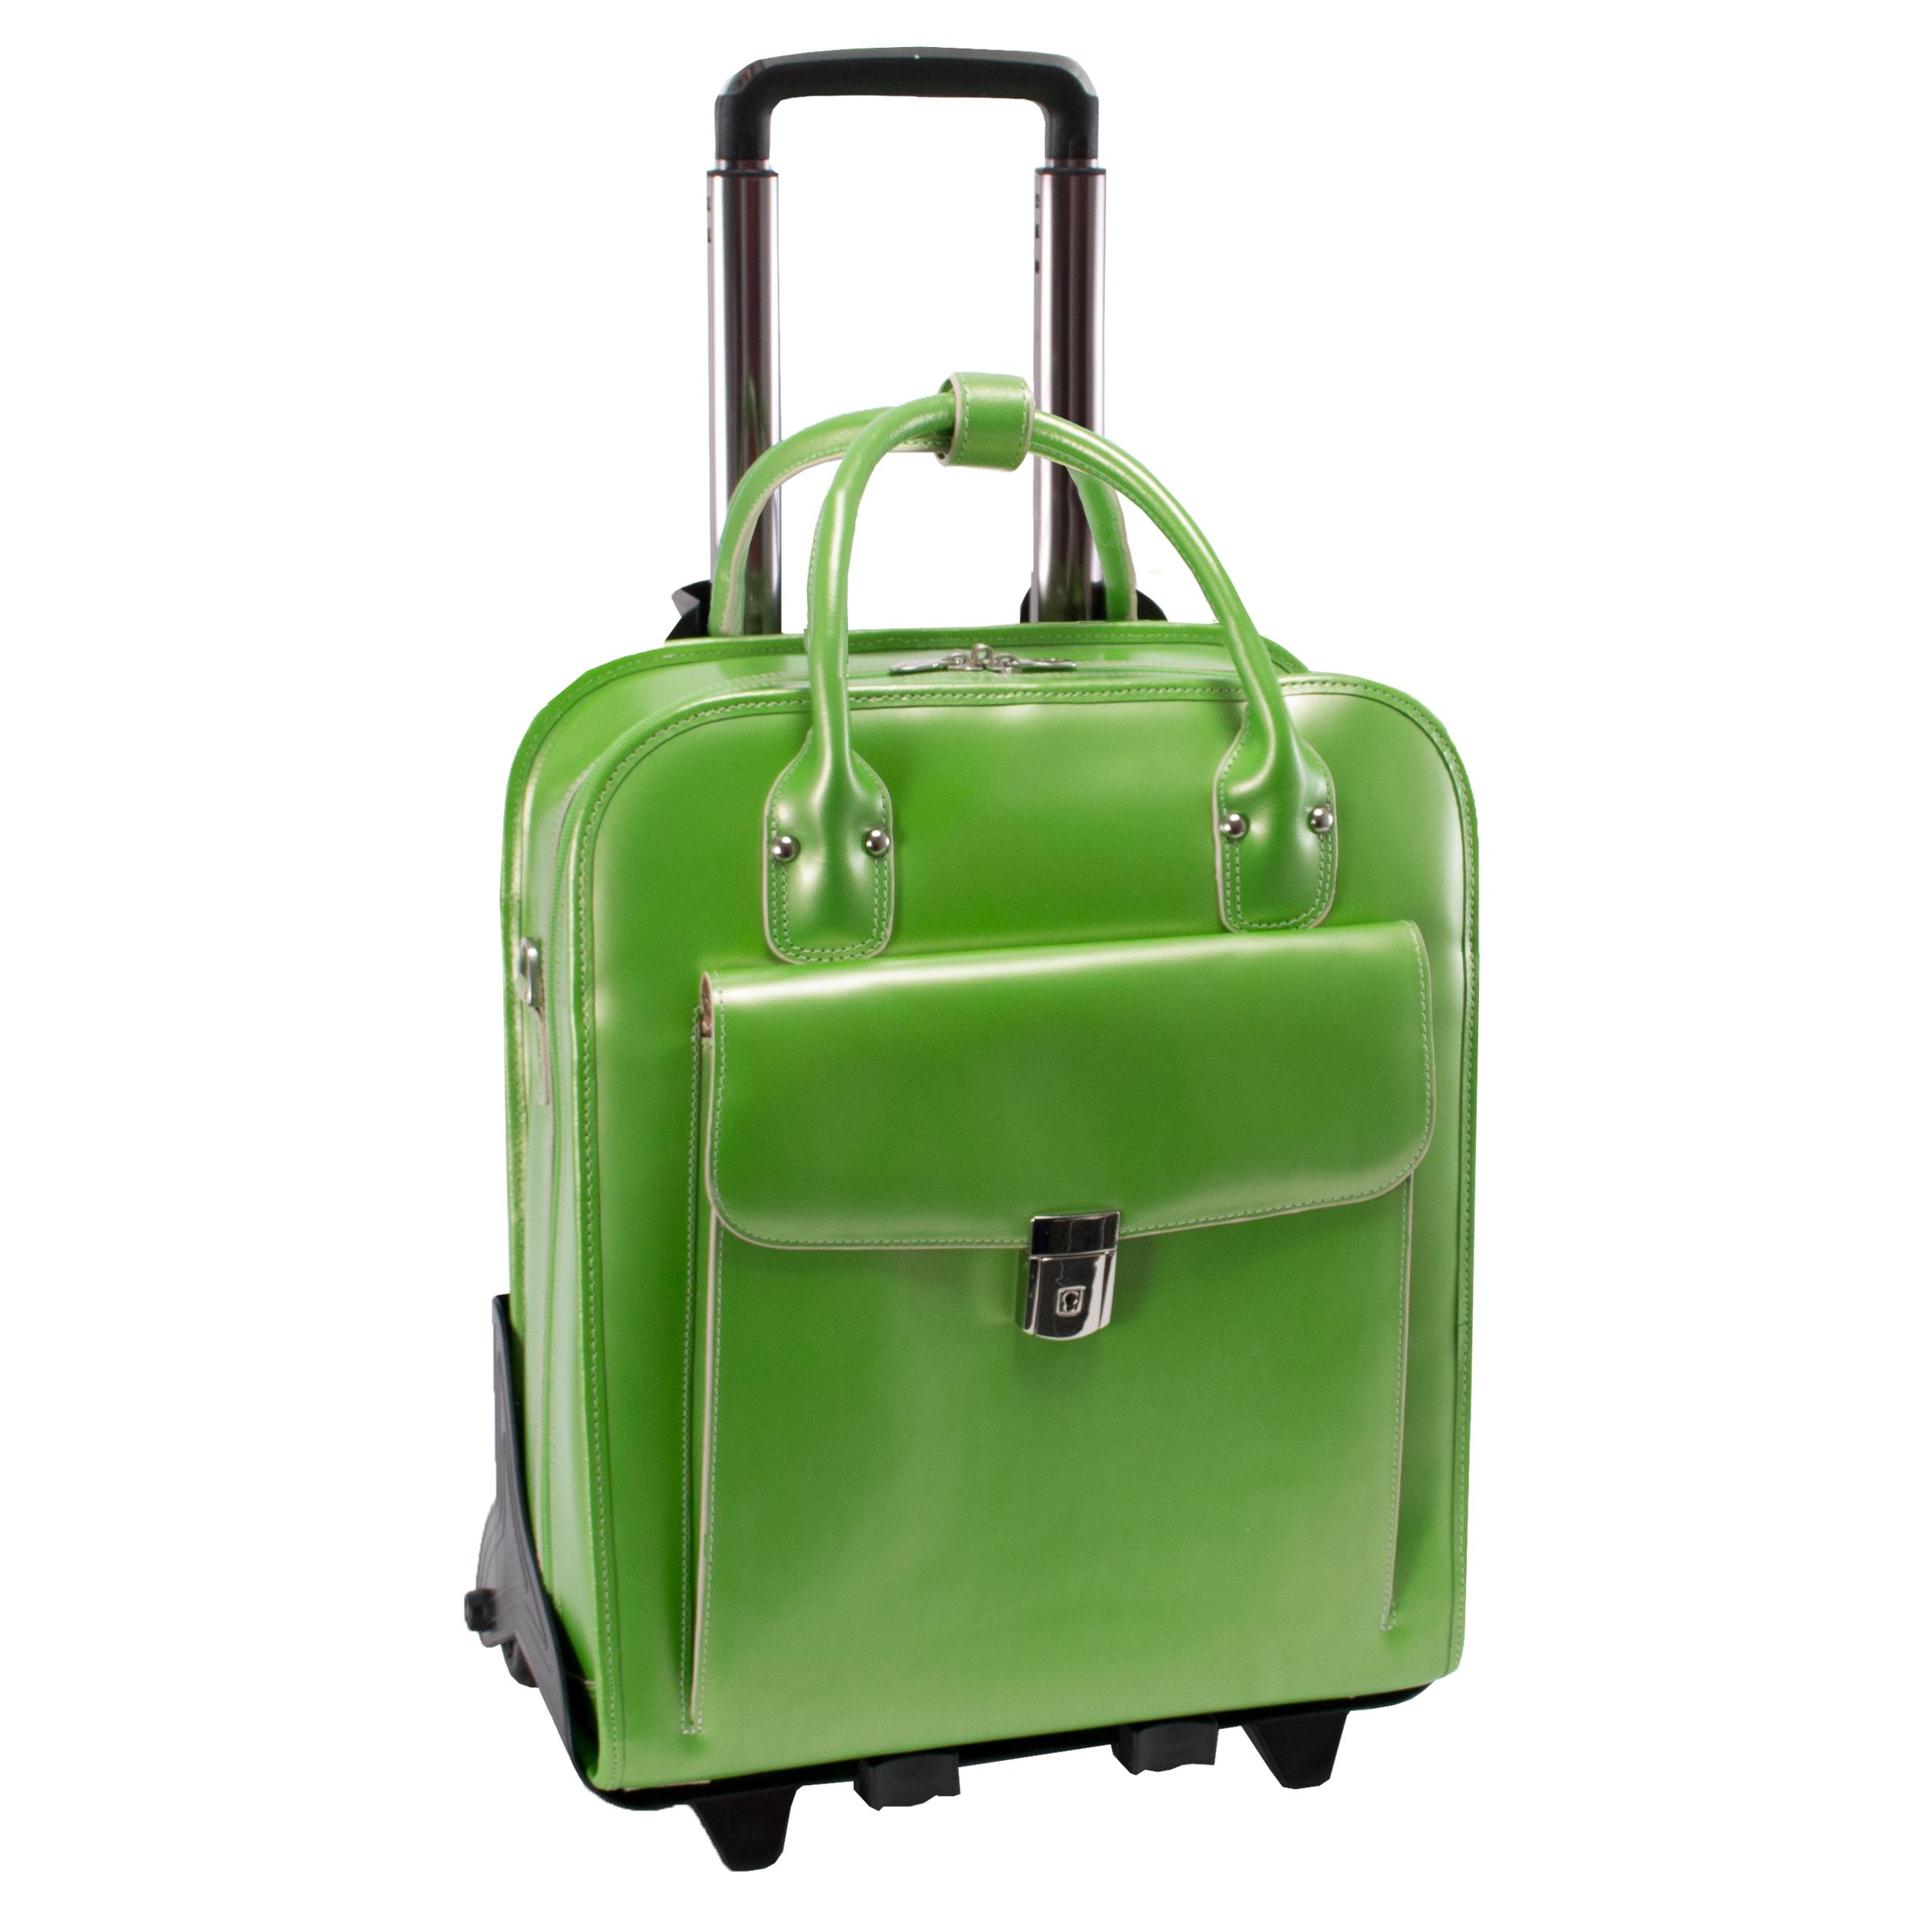 La Grange 96491 green leather vertical detachable-wheeled ladies' briefcase